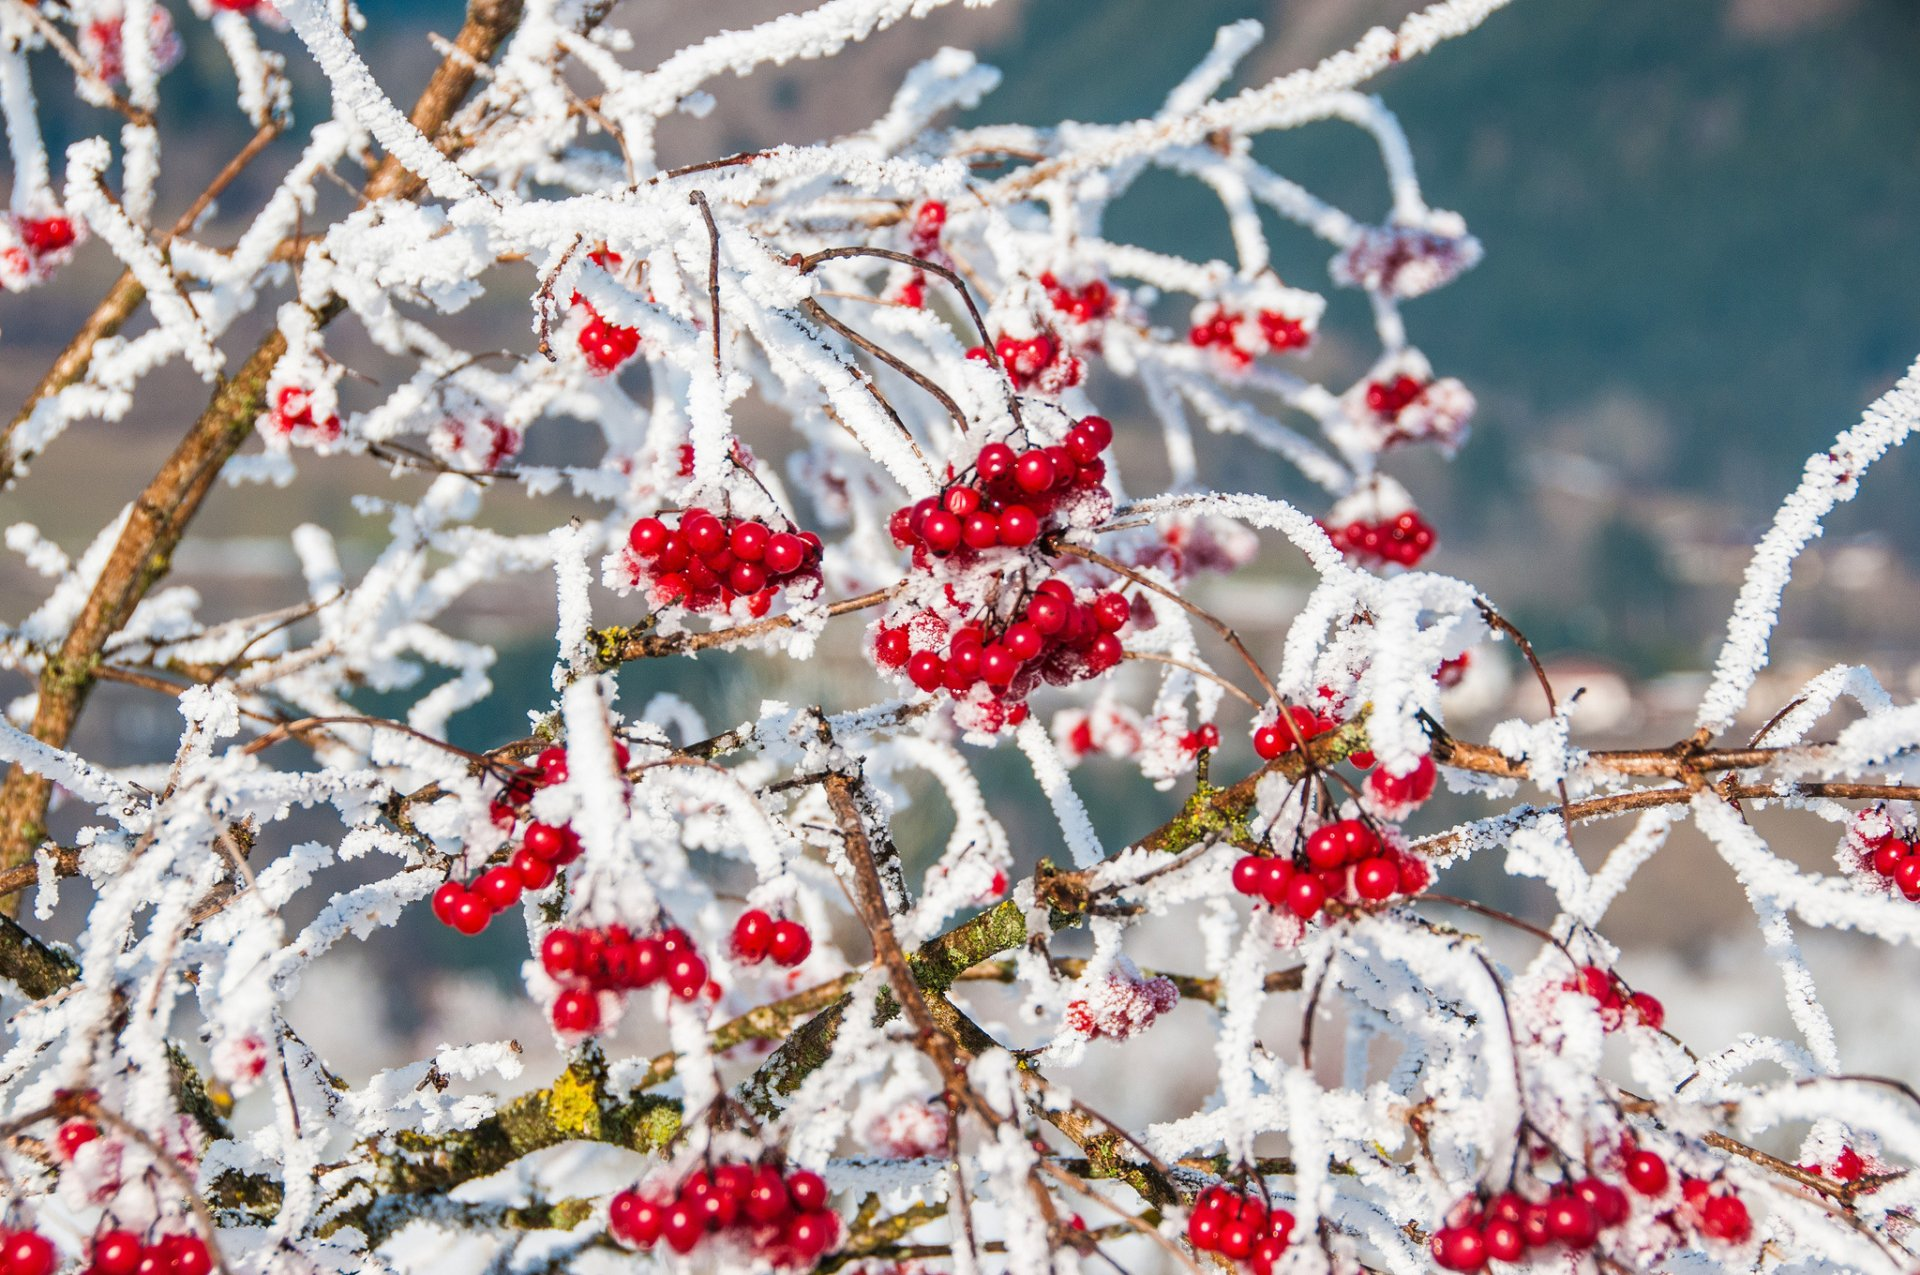 природа ветка снег  № 3089927 бесплатно